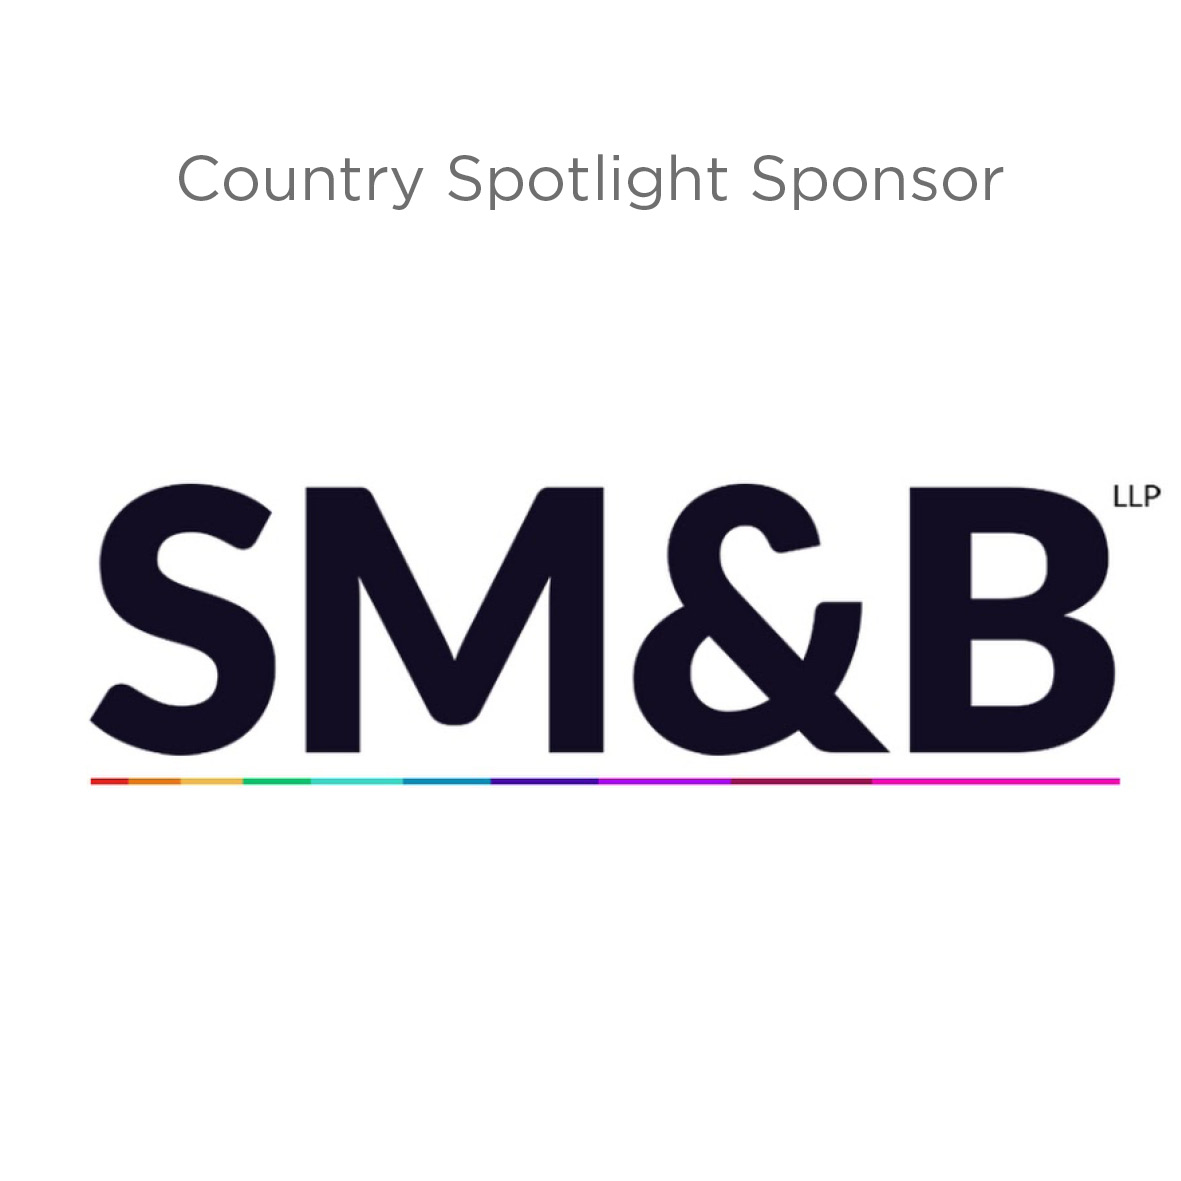 SM&B logo